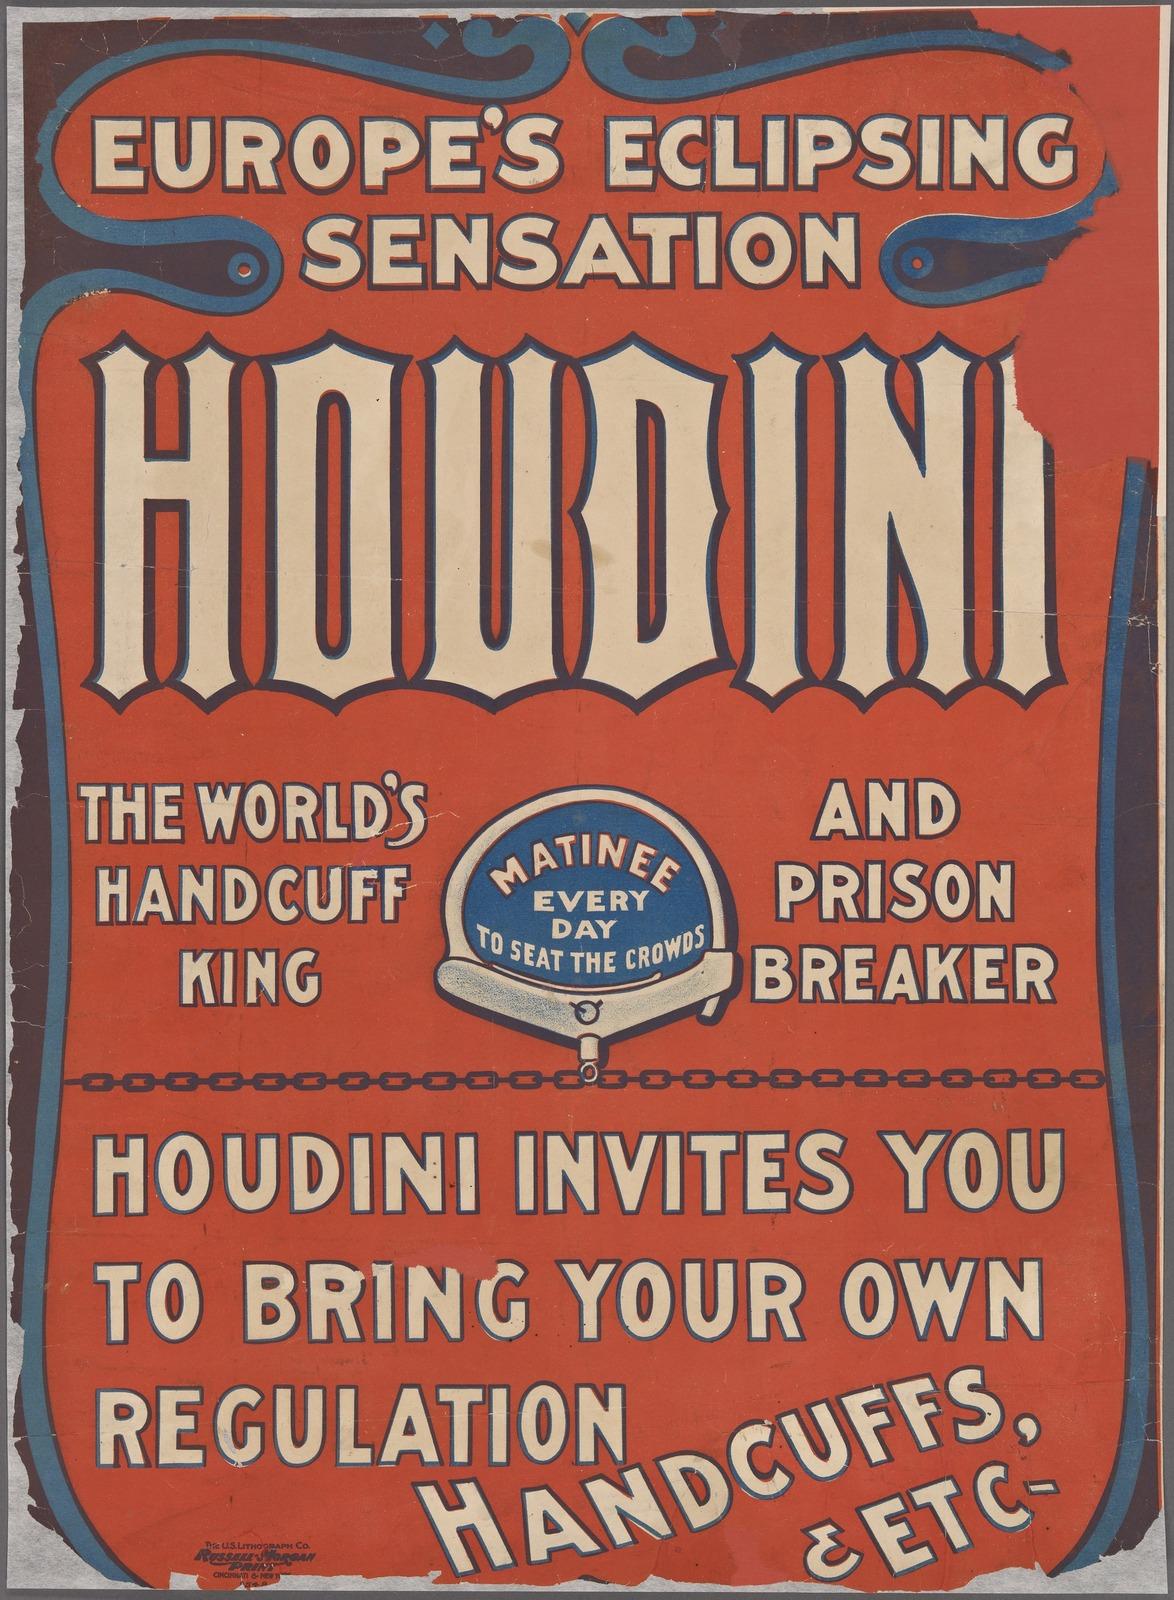 Harry Houdini: the world's handcuff king and prison breaker